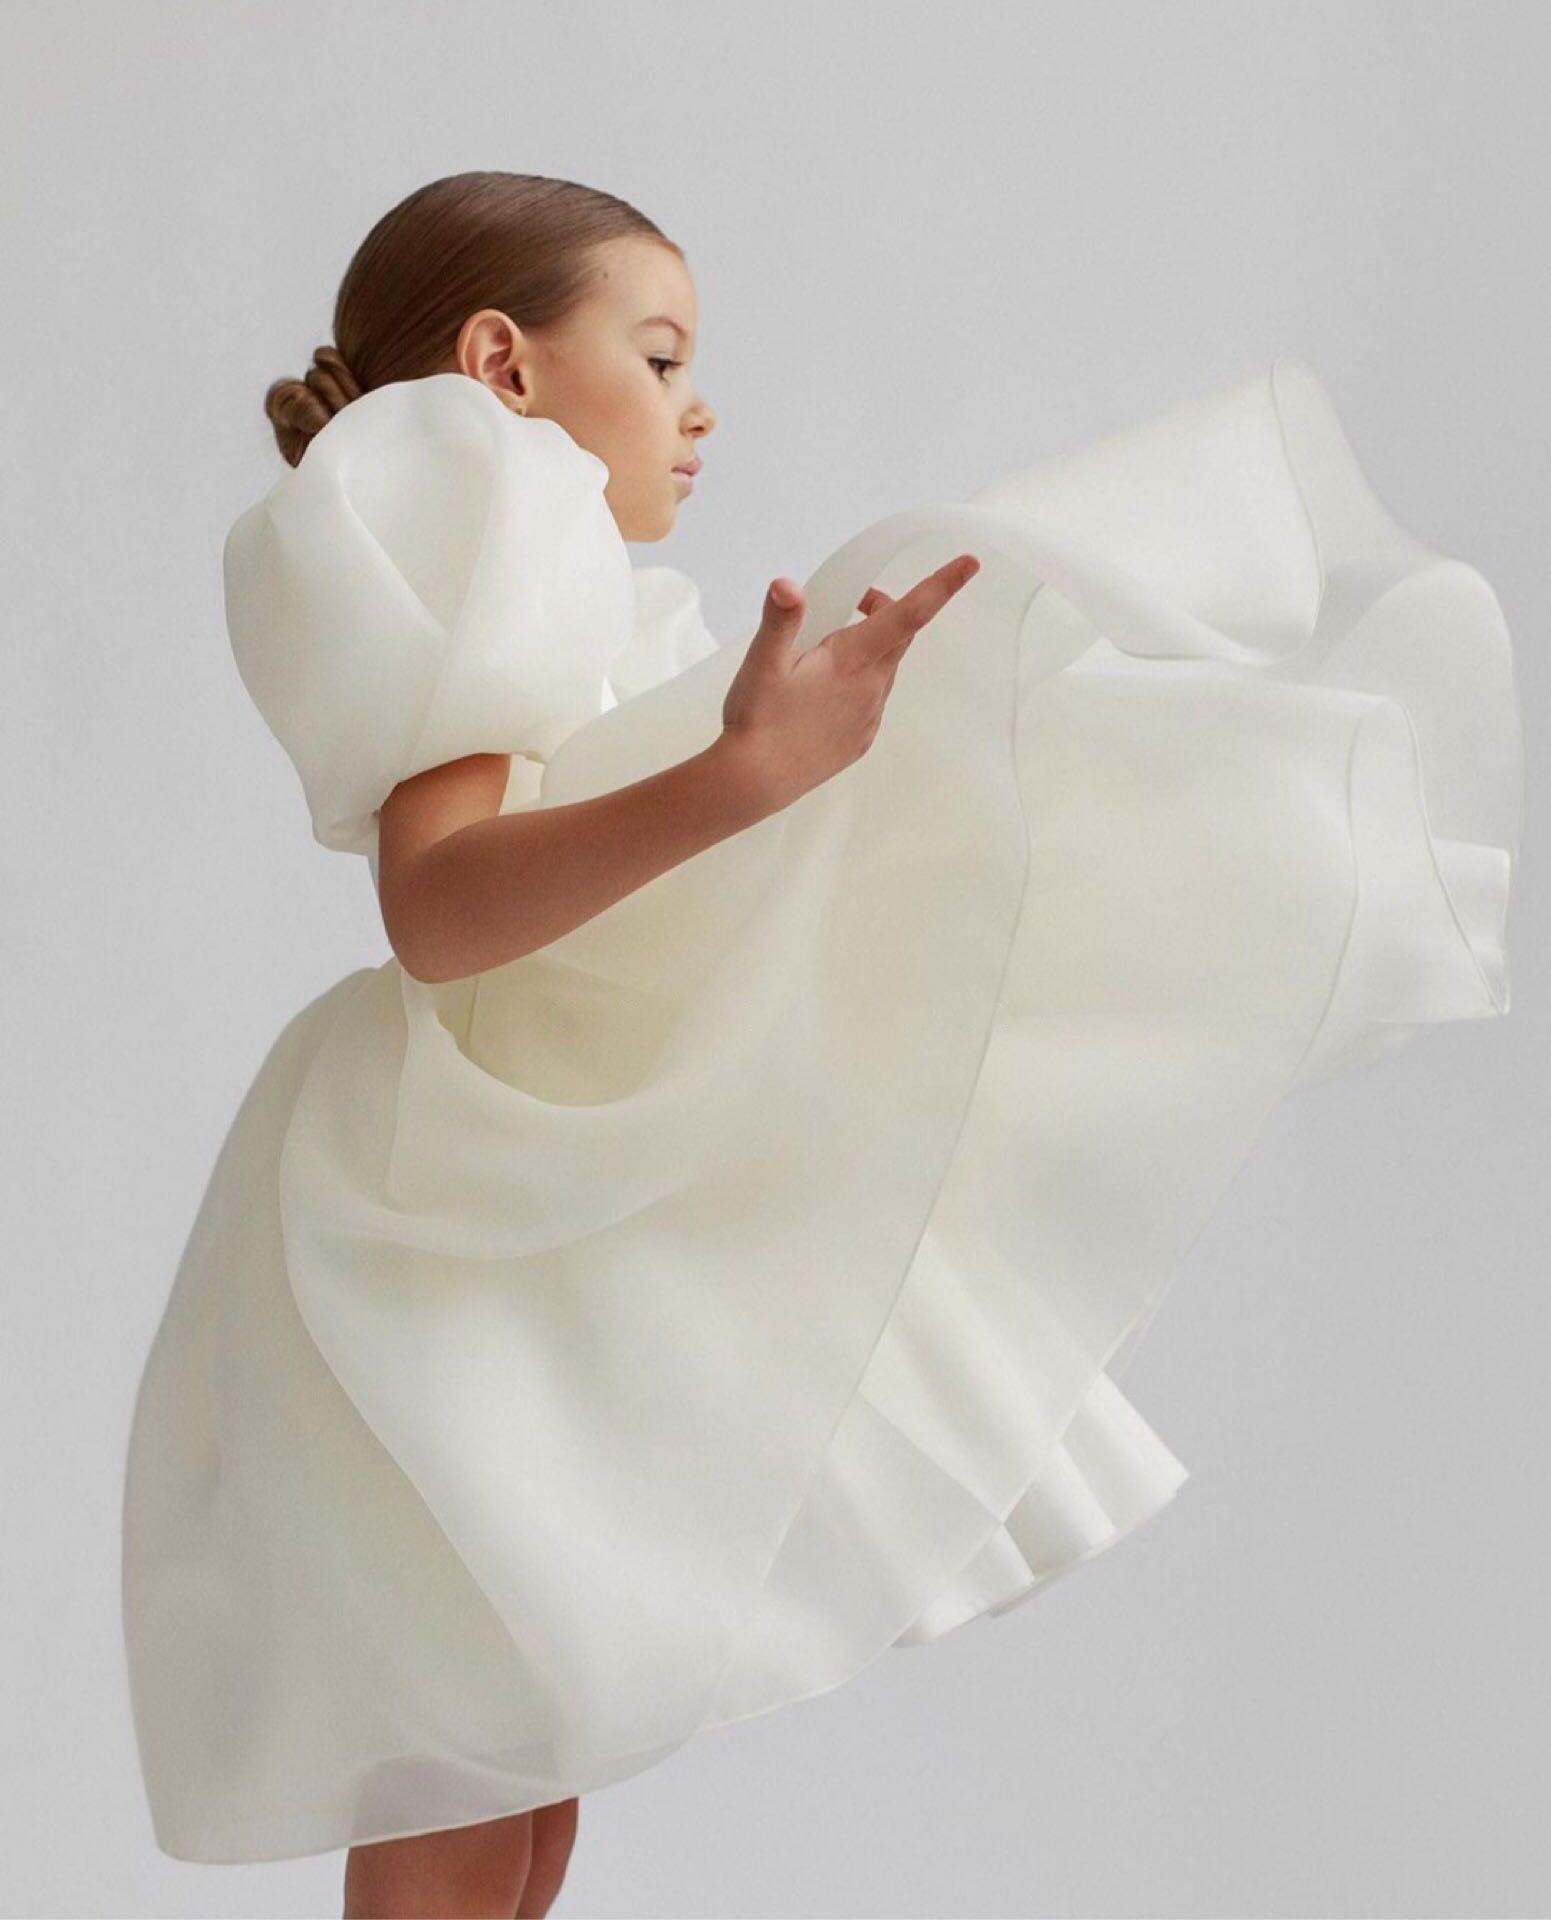 6M-10Y Fashion Baby Girl Princess Vintage Dress Puff Sleeve Tulle Children Dress White Wedding Birth